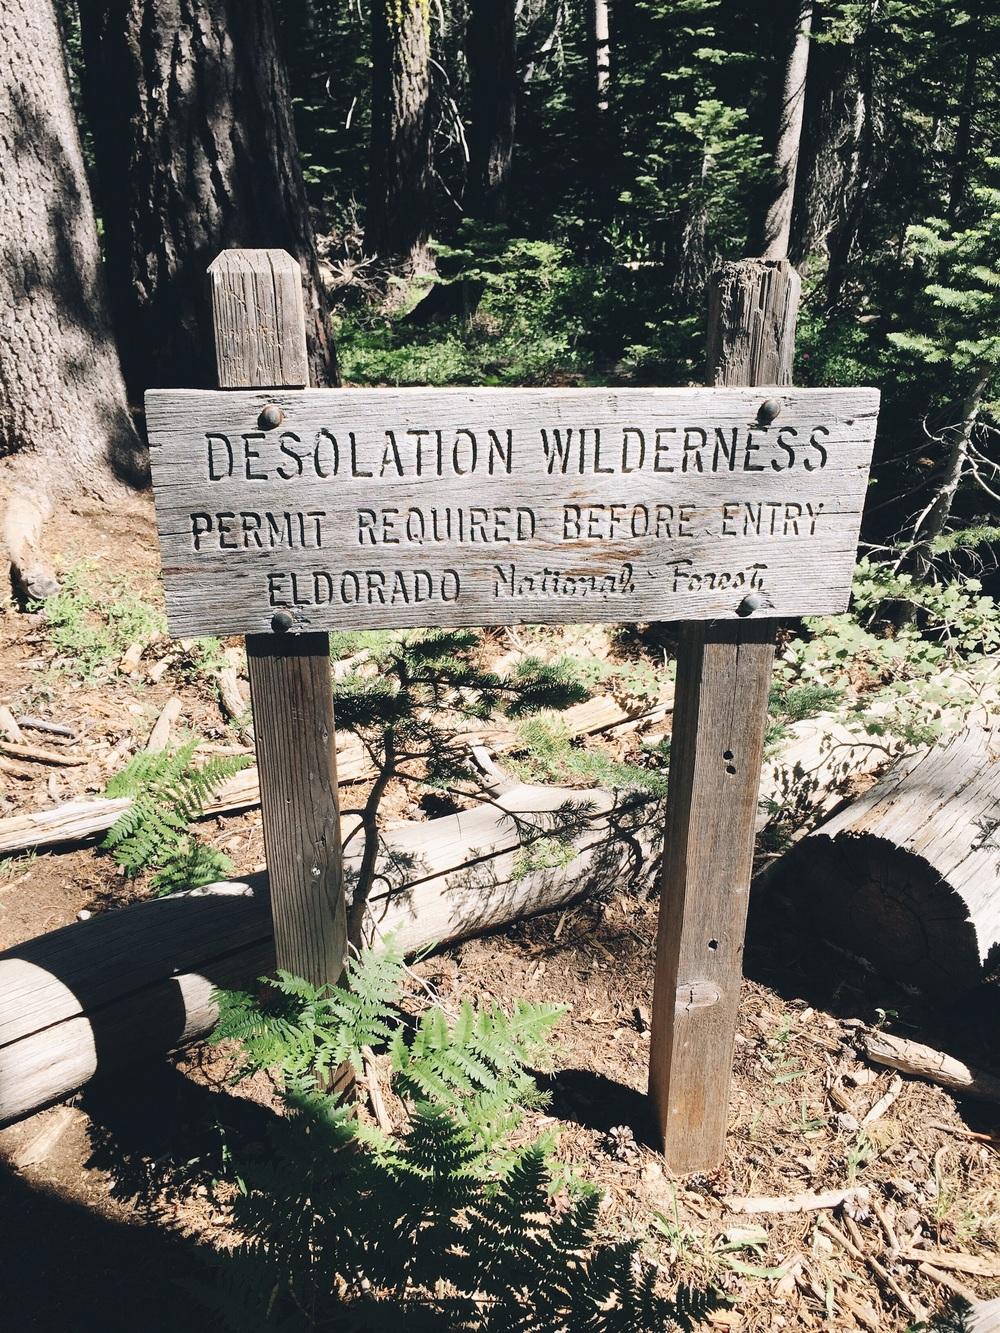 Entered into desolation wilderness.